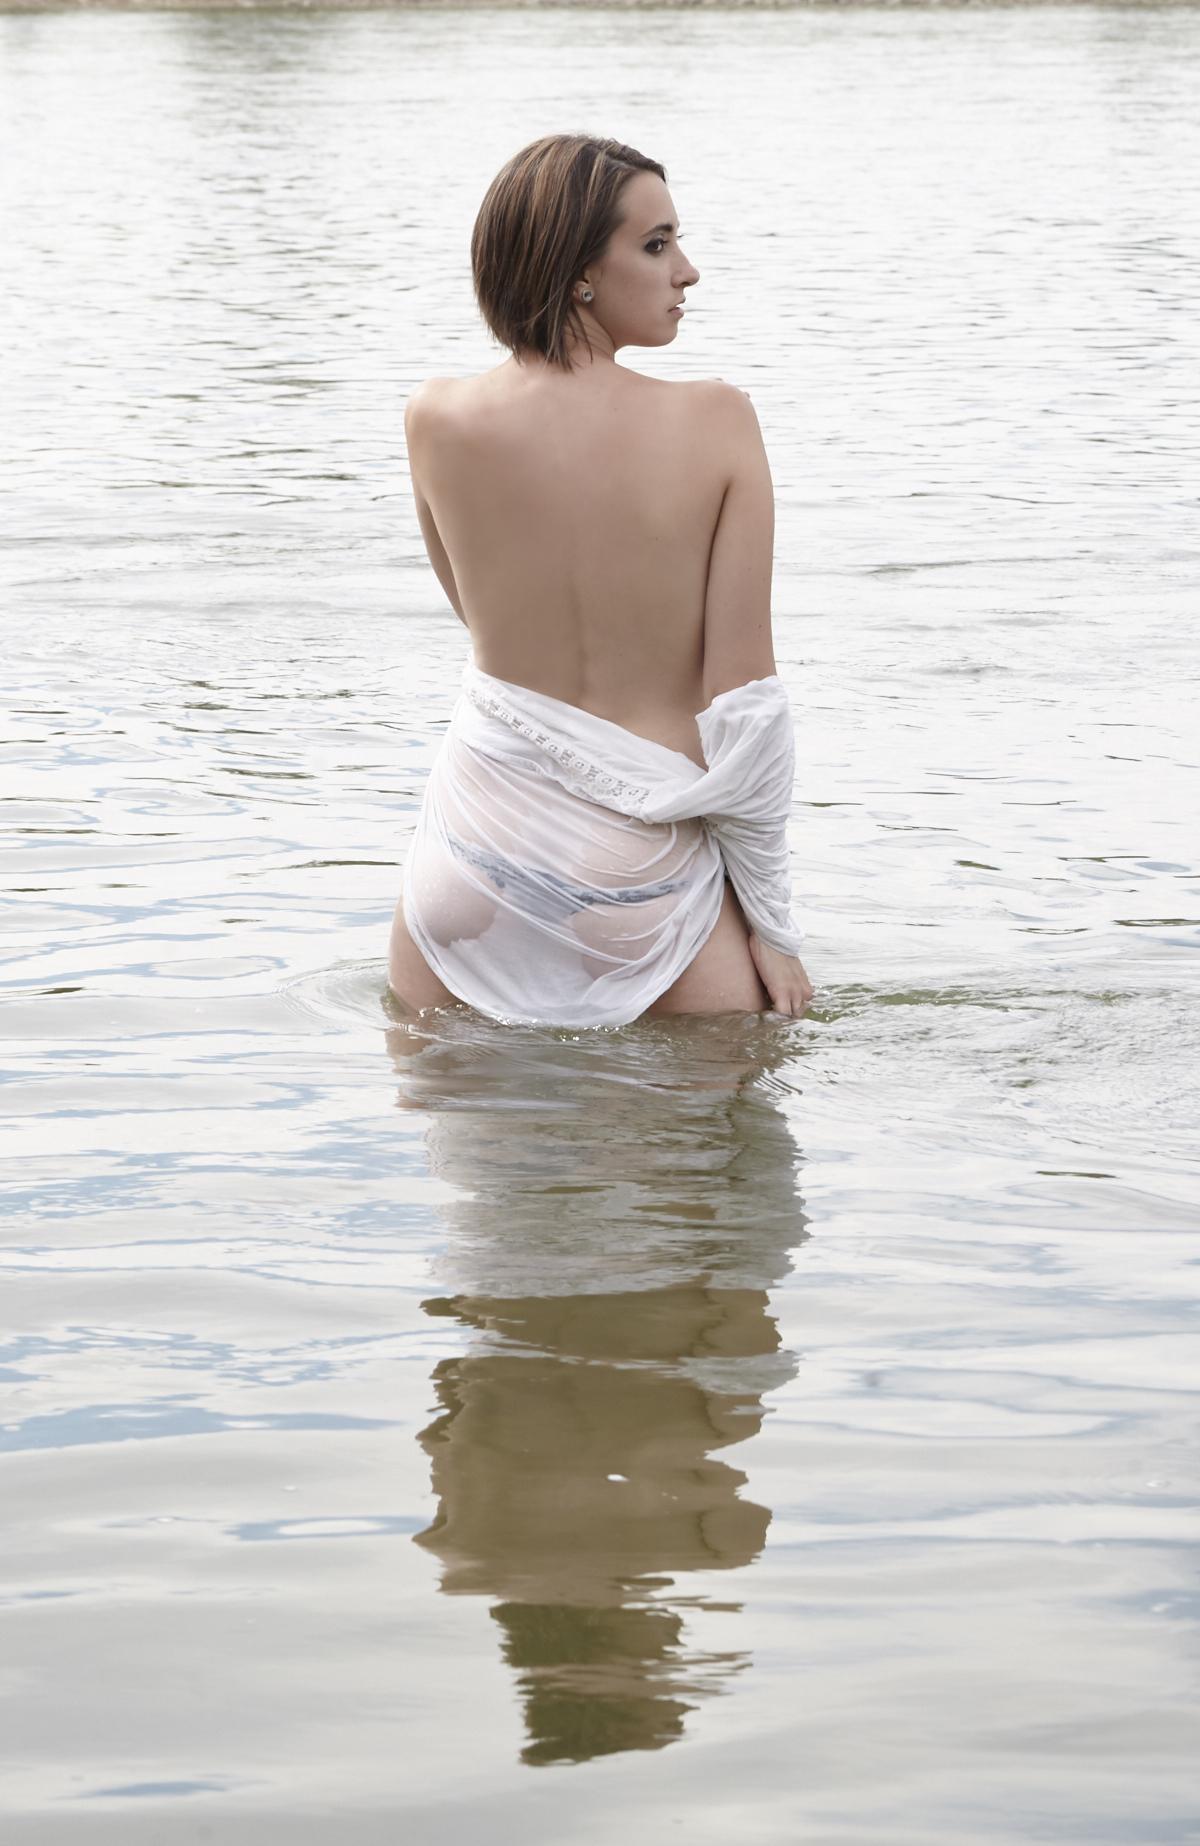 28998 -5996 -professional-boudoir-photography-cindy-moleski-saskatoon-saskatchewan.jpg